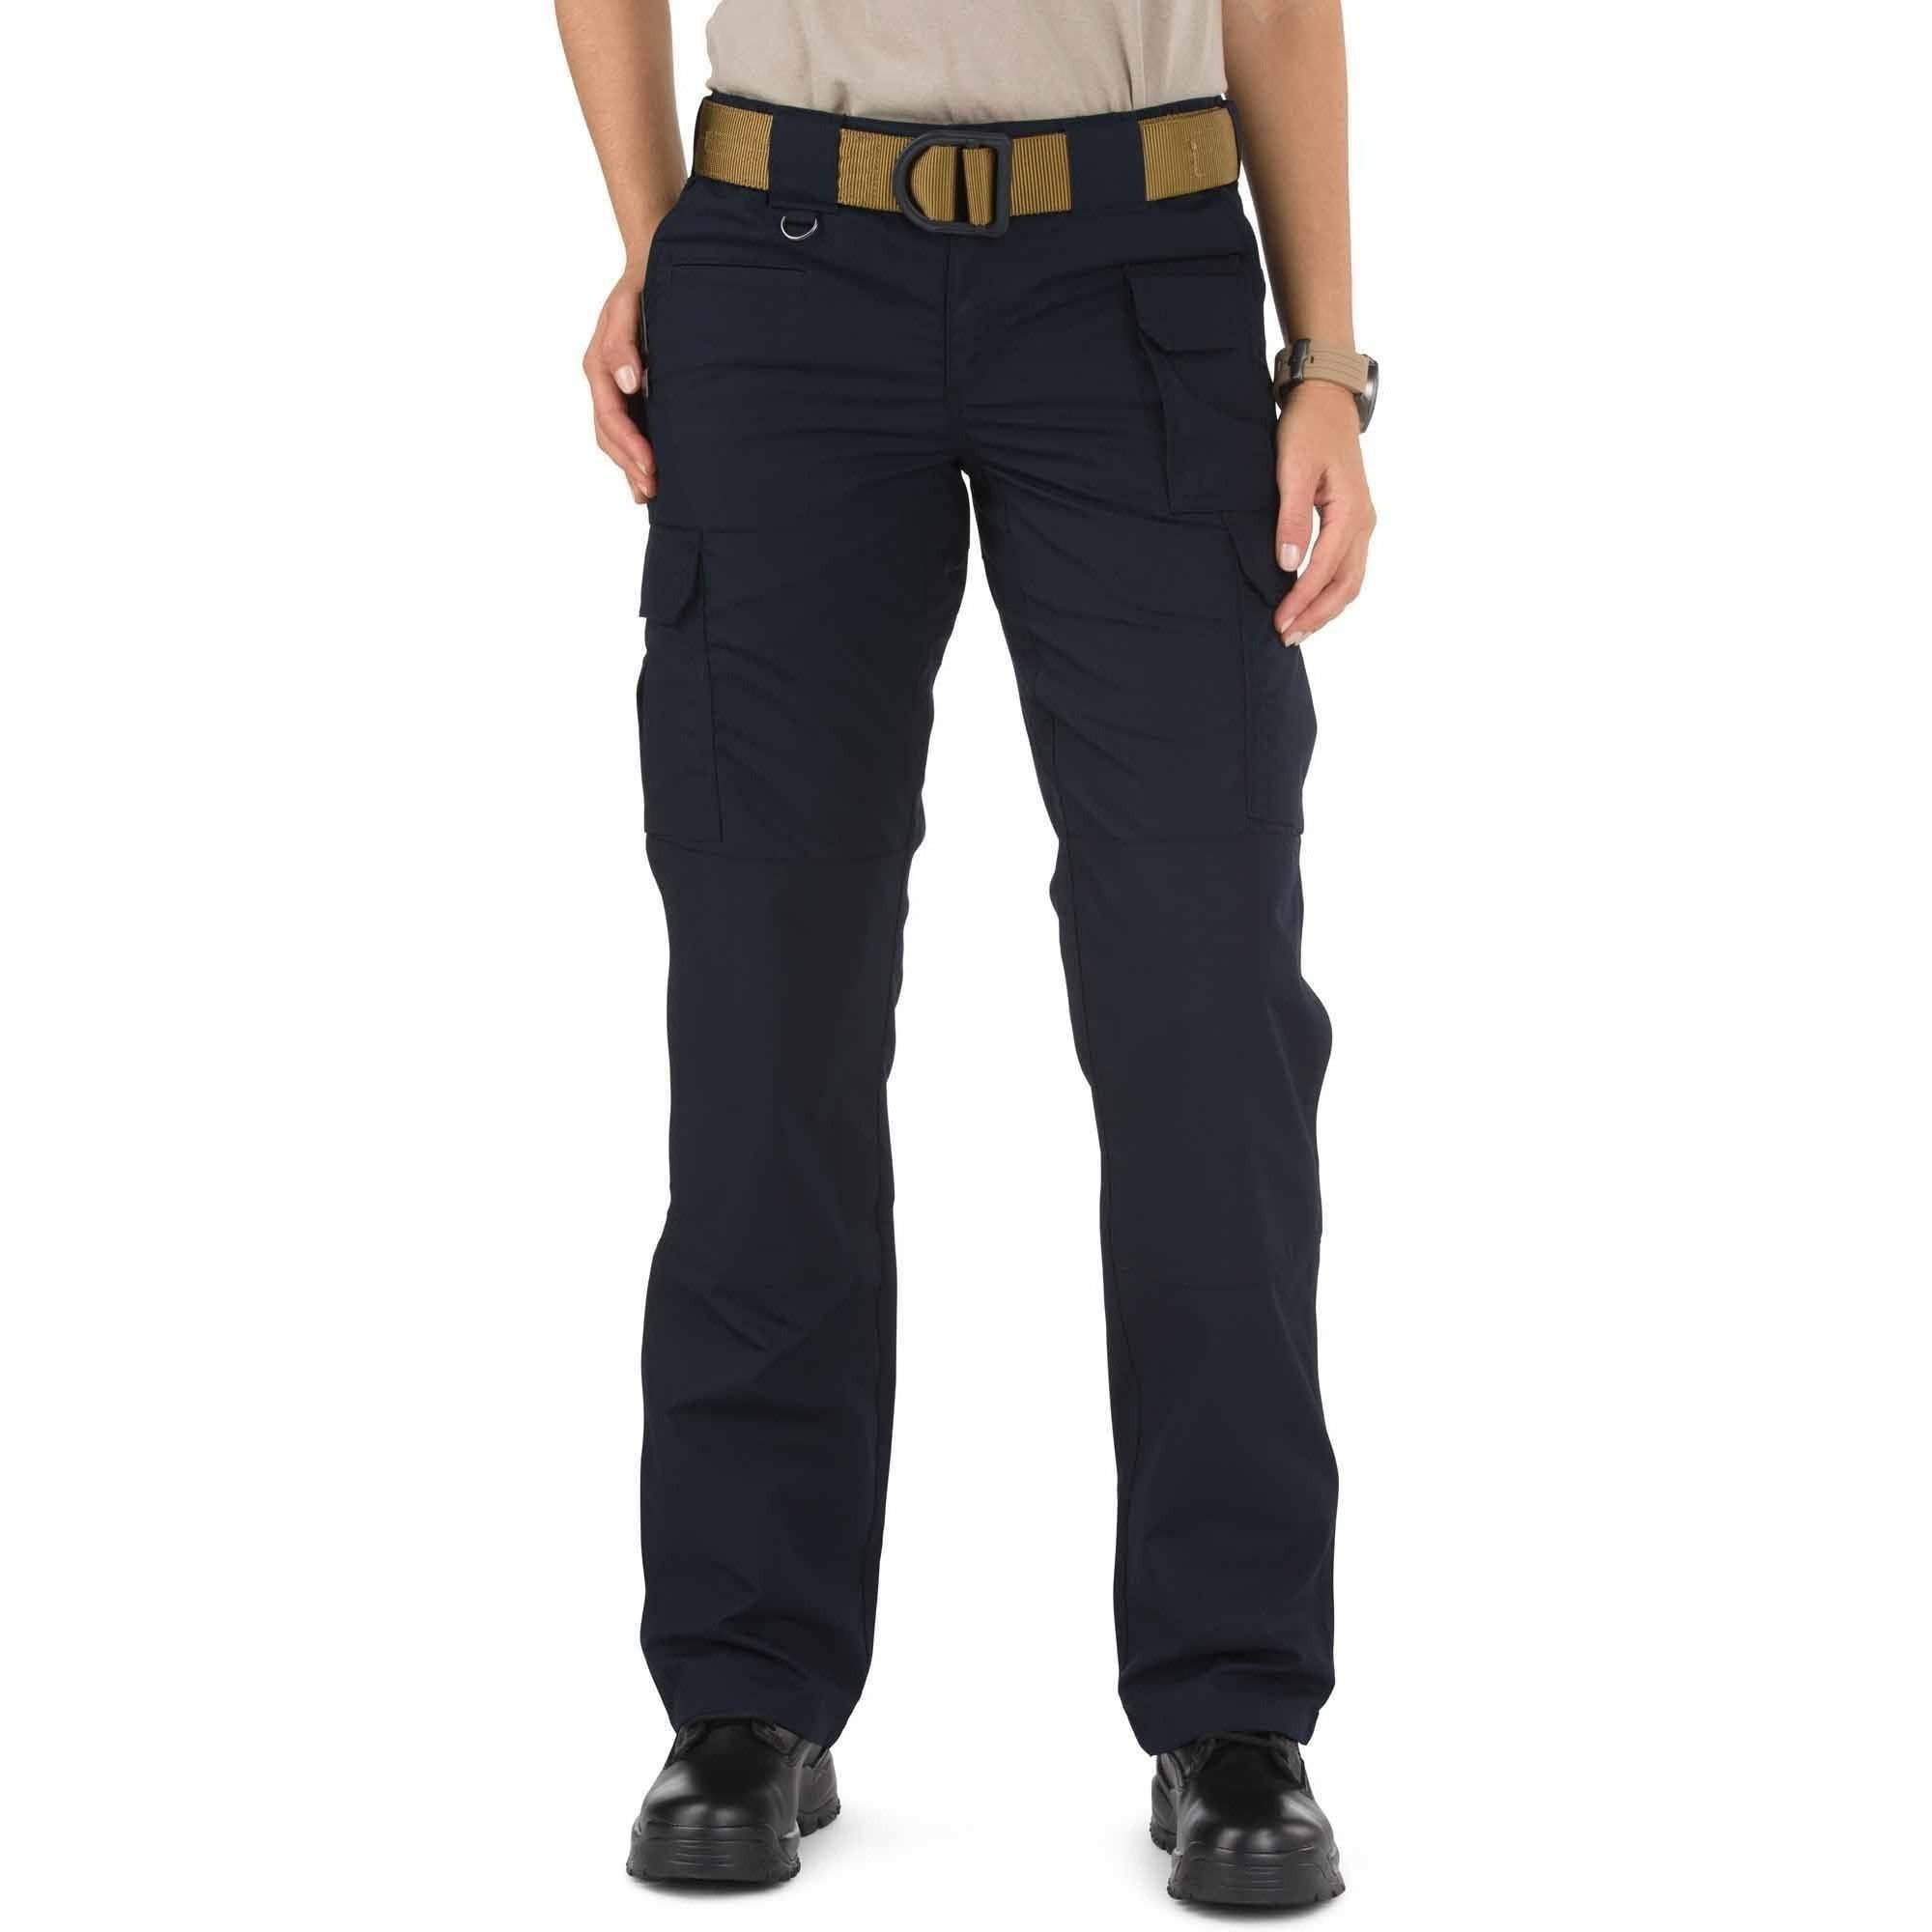 Women's Taclite Professional Pant, Dark Navy